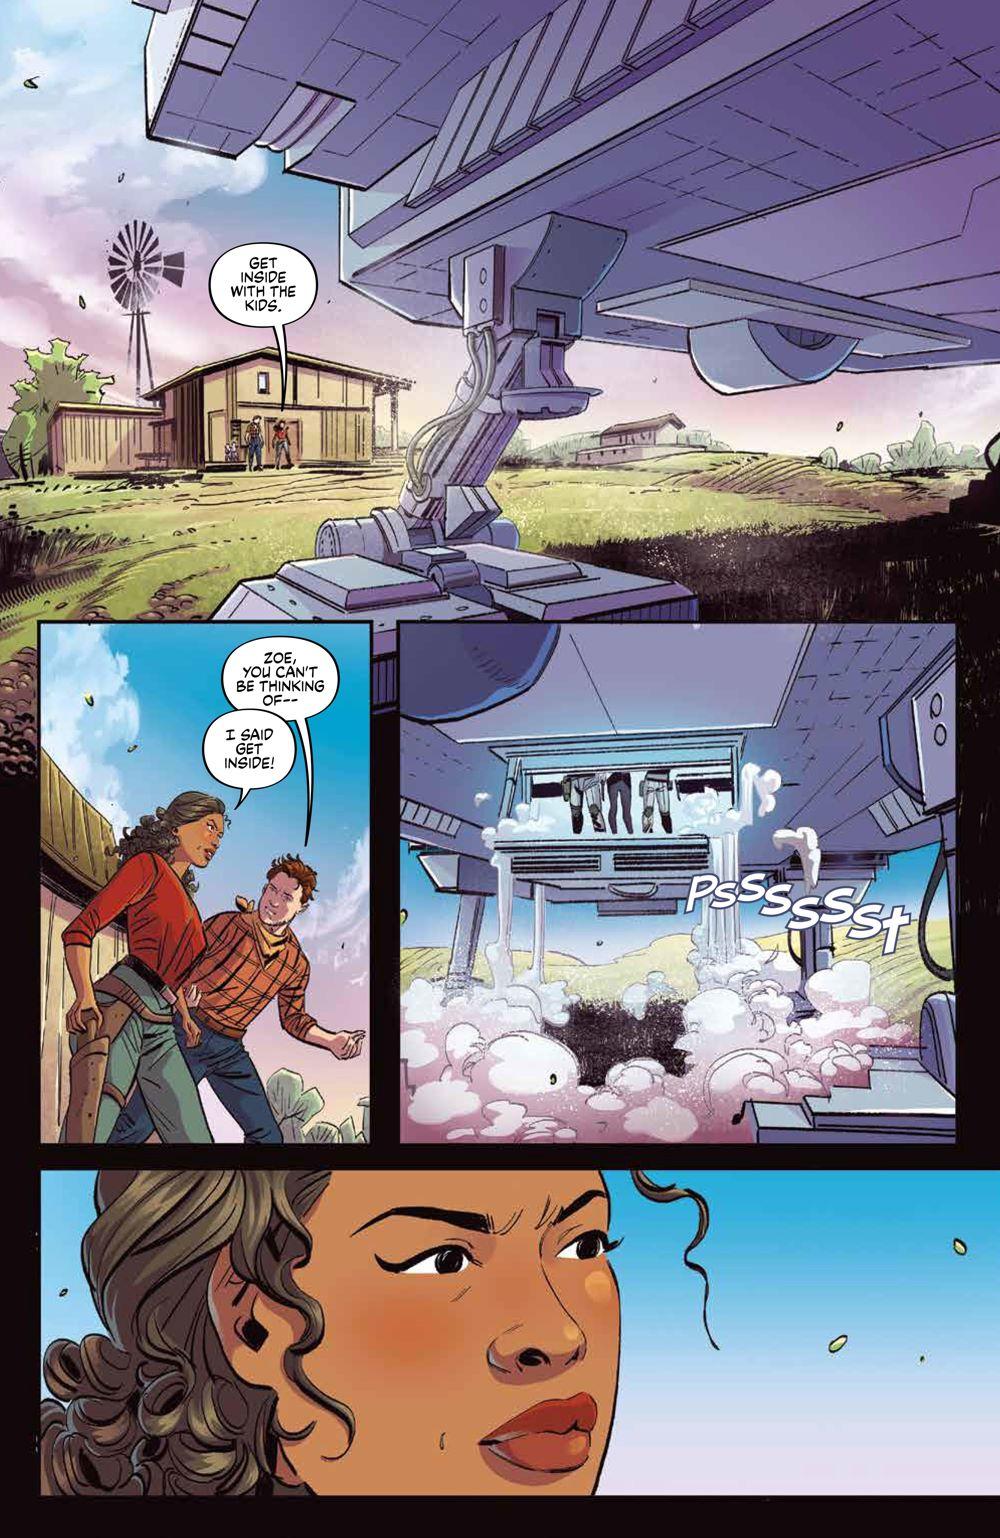 Firefly_BrandNewVerse_004_PRESS_3 ComicList Previews: FIREFLY A BRAND NEW 'VERSE #4 (OF 6)